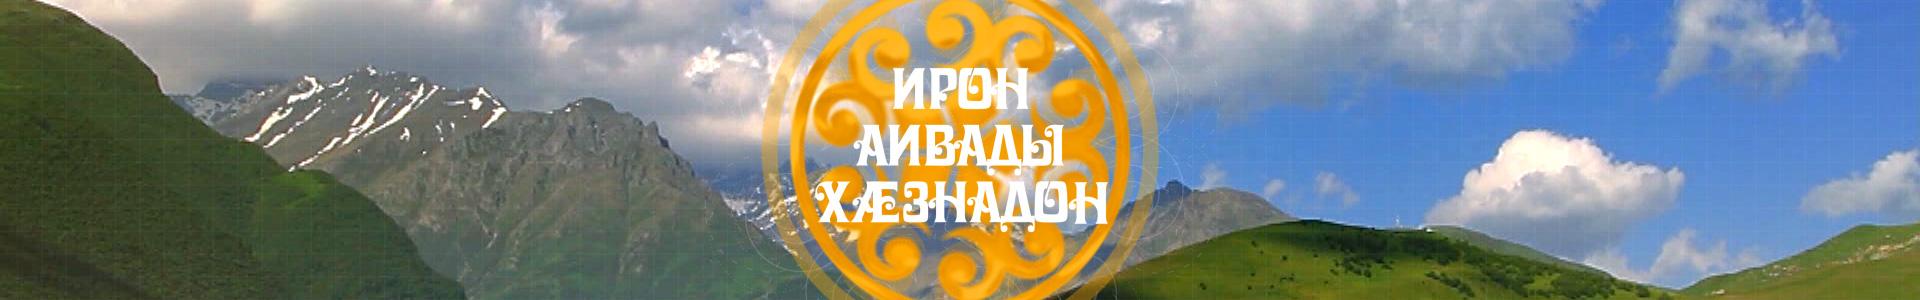 Ирон аивады хæзнадон